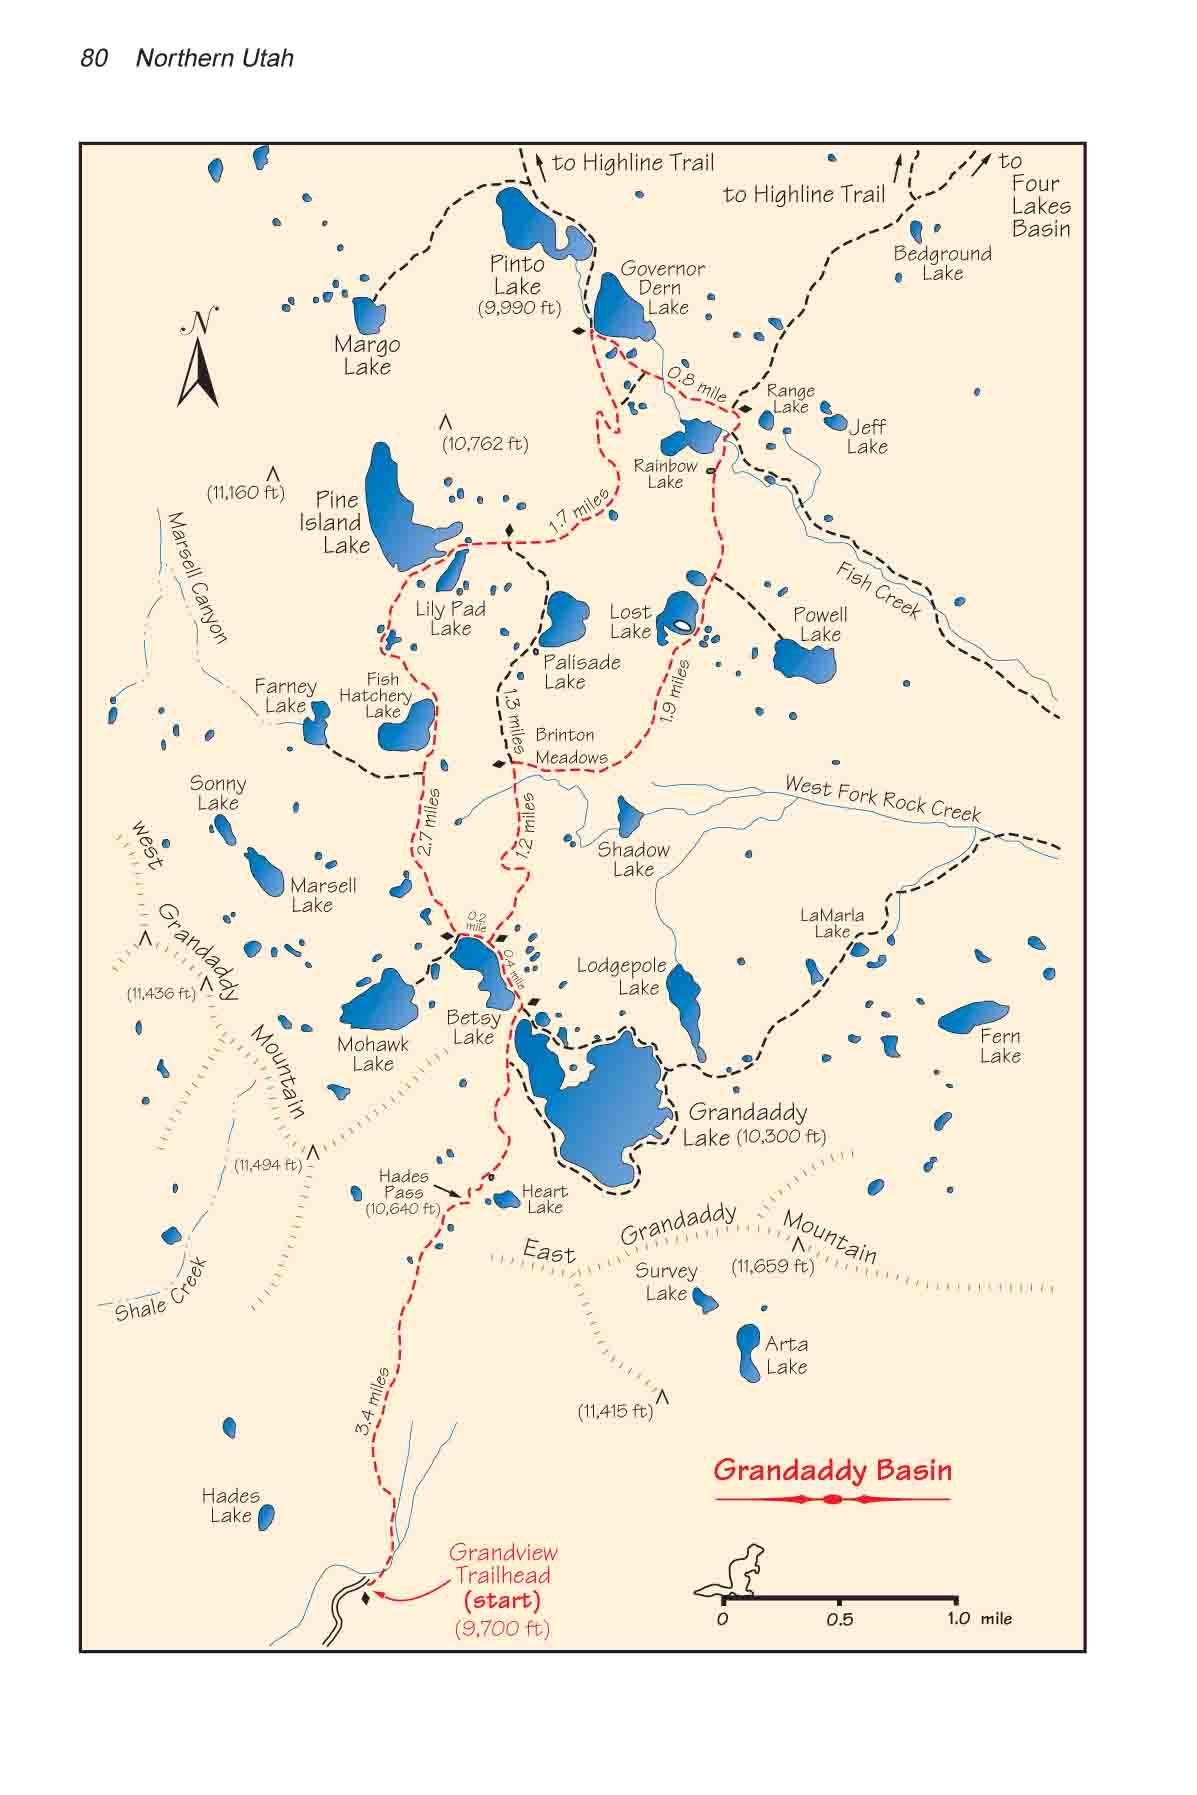 Grandaddy Basin (High Uintas Wilderness Area)